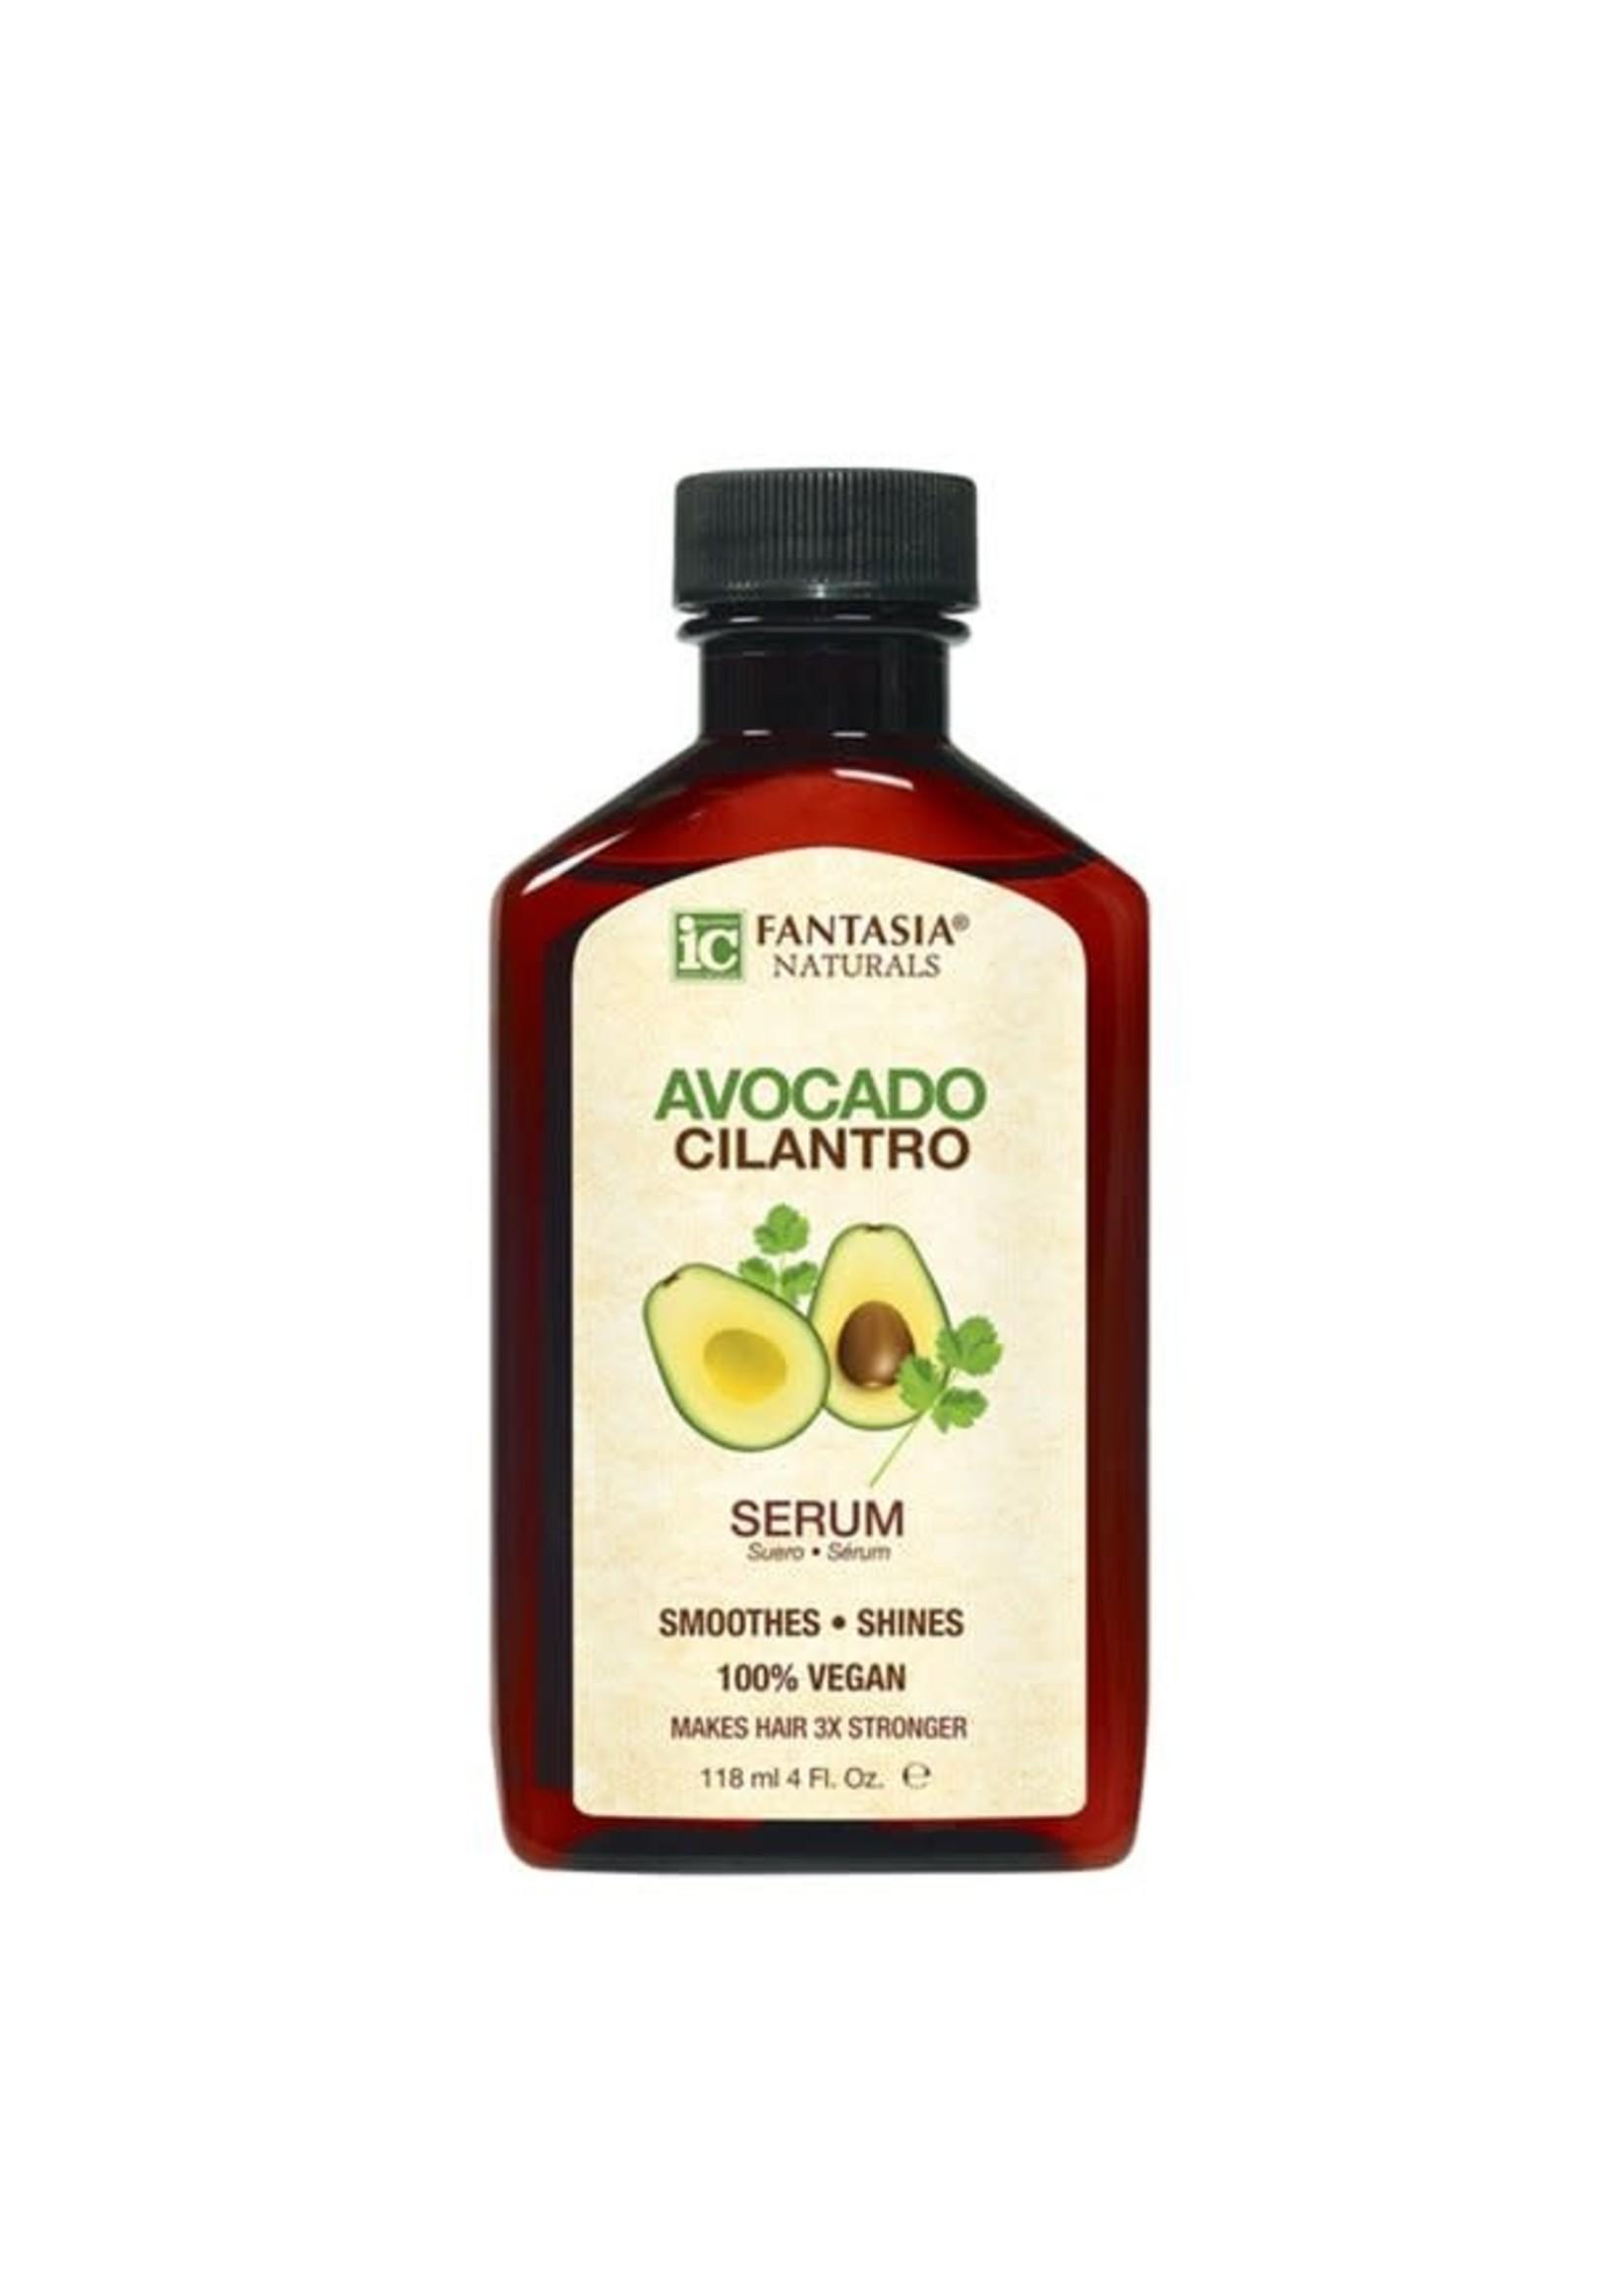 Fantasia Avocado & Cilantro Serum